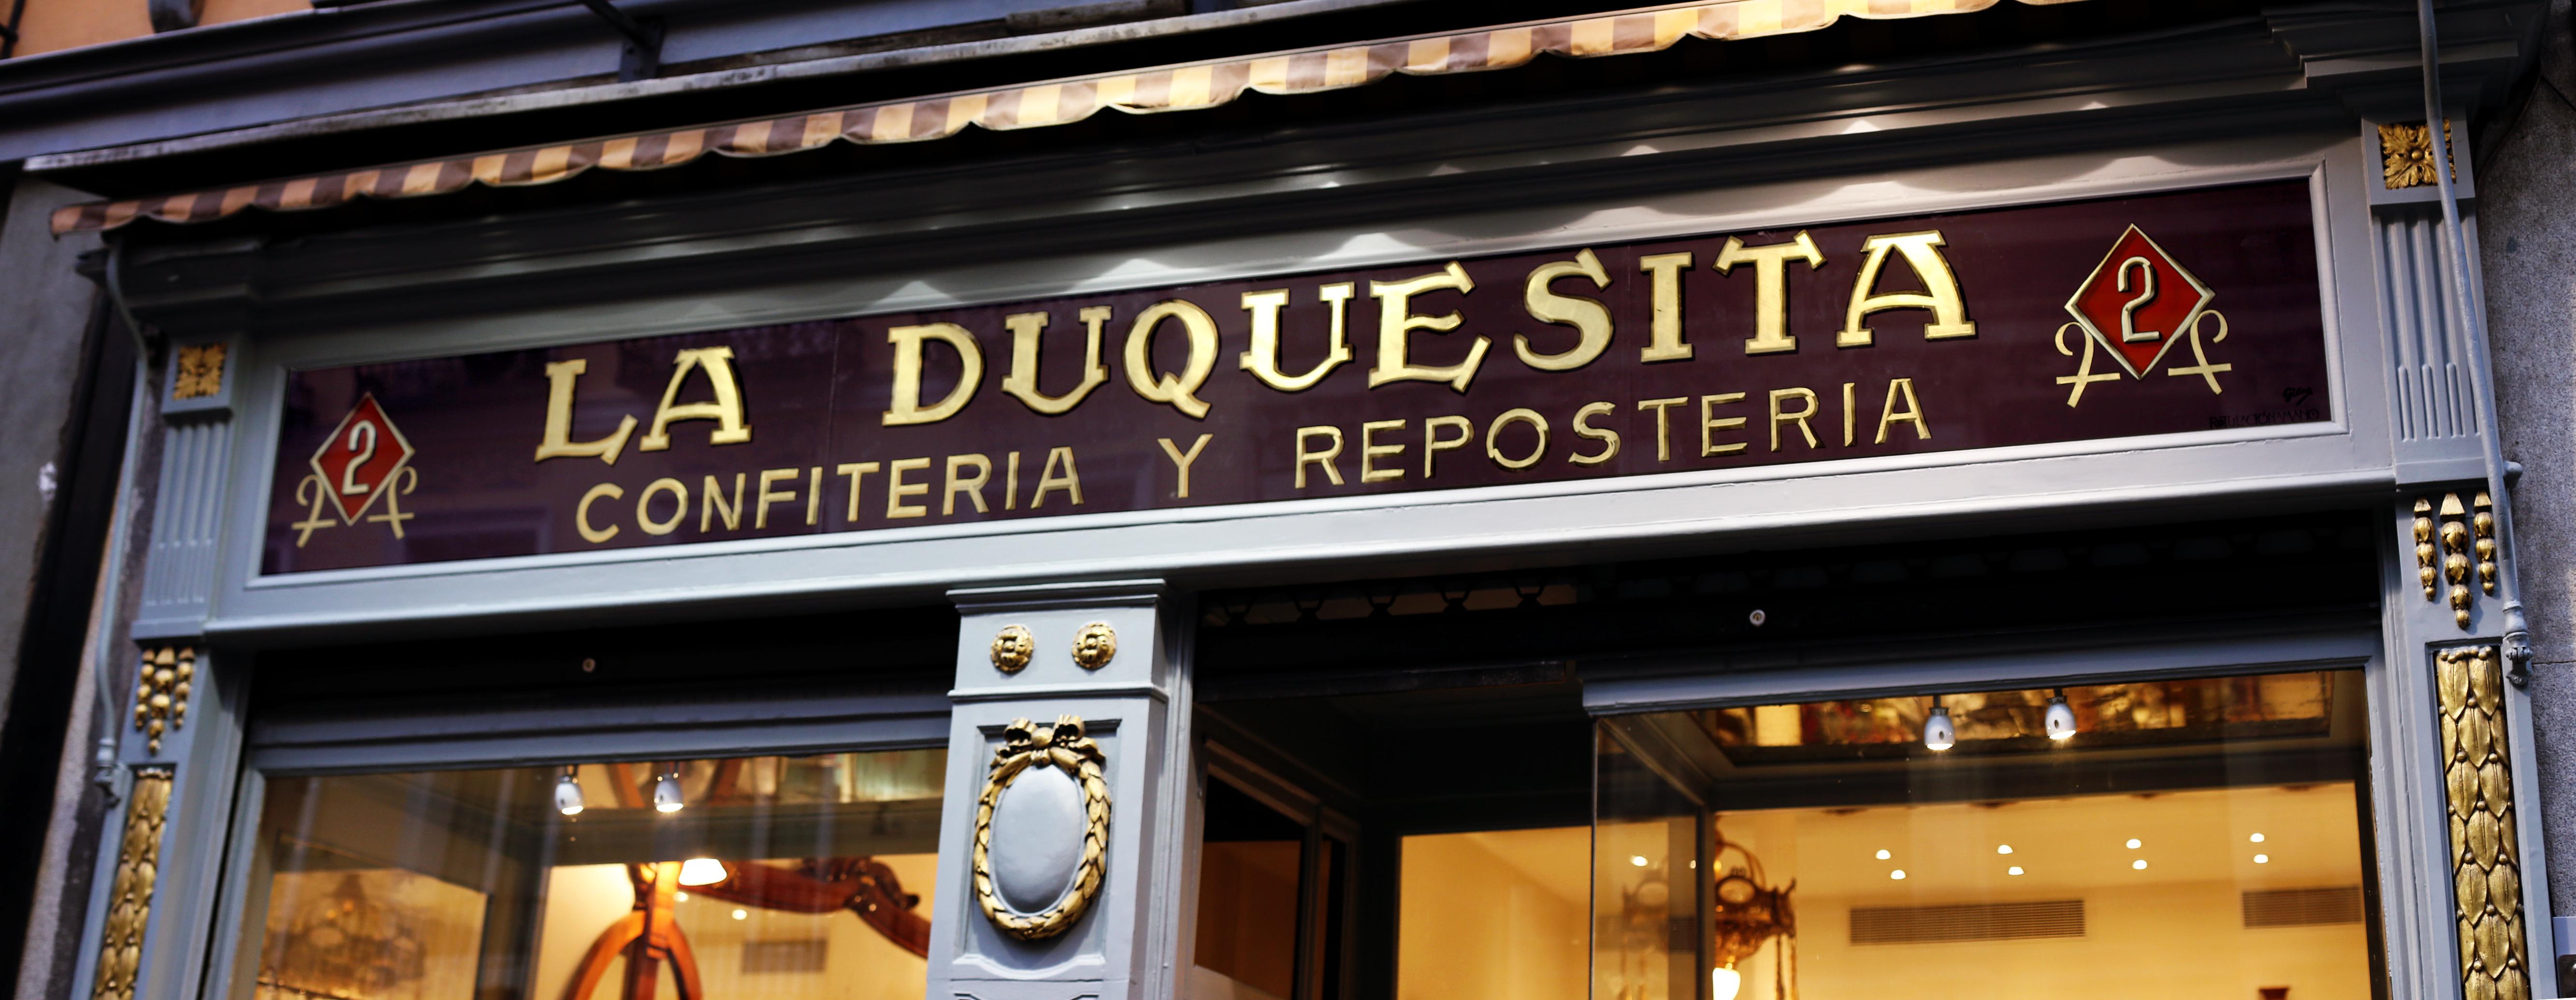 La duquesita Madrid rotulacion a mano (1)